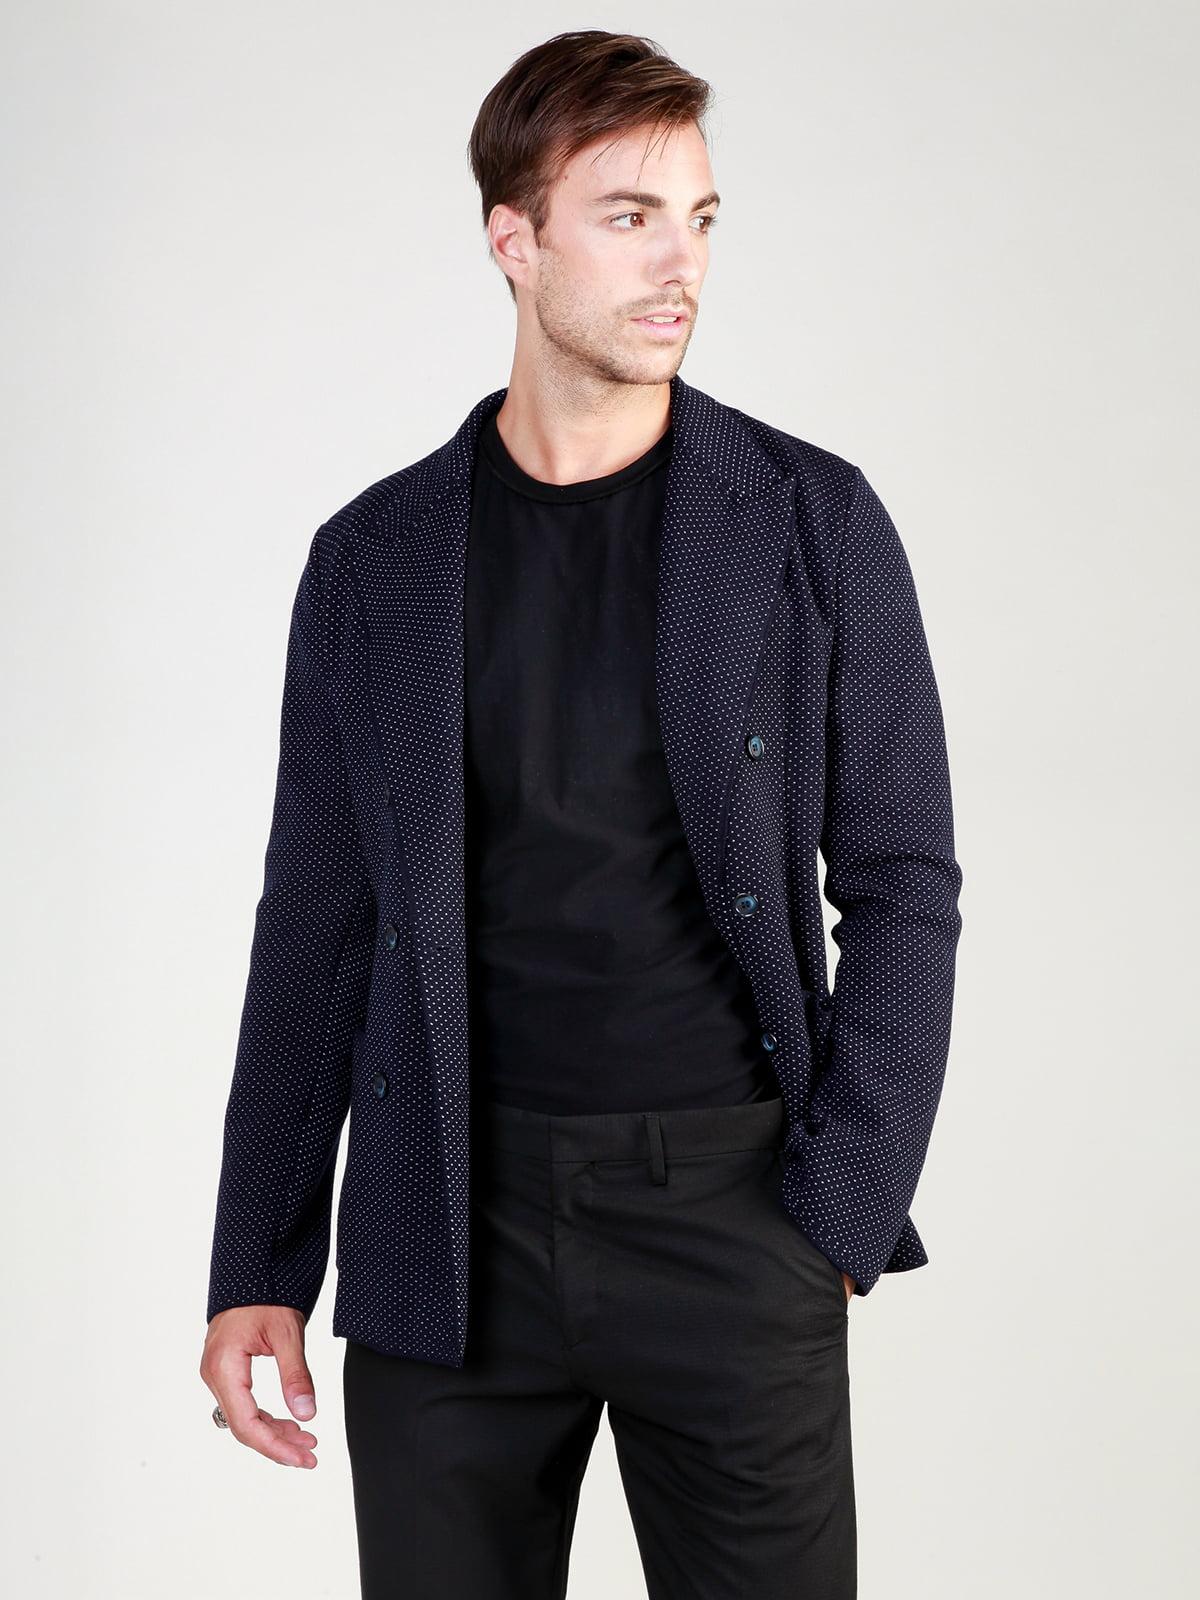 Пиджак темно-синий в рисунок | 3748934 | фото 6